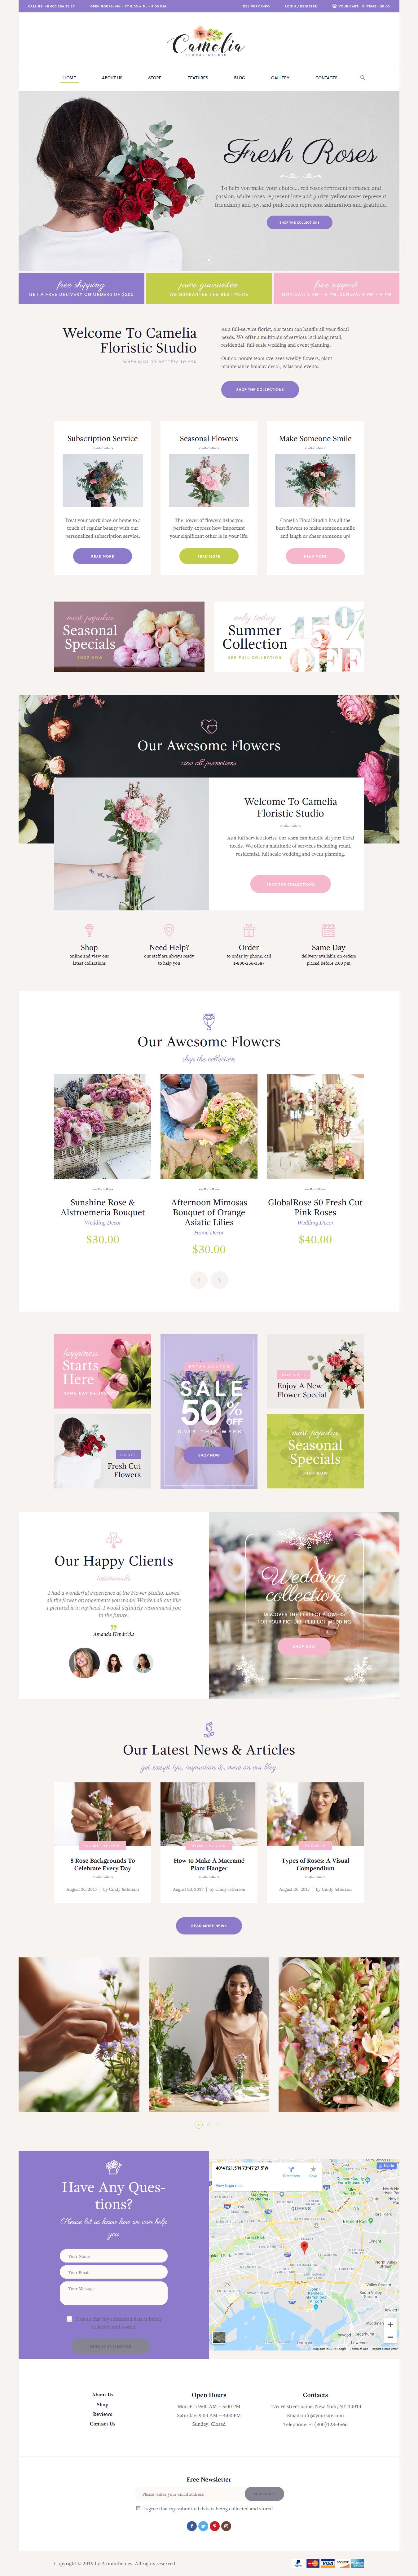 camelia best premium florist floriculture wordpress theme - 10+ Best Premium Florist and Floriculture WordPress Themes